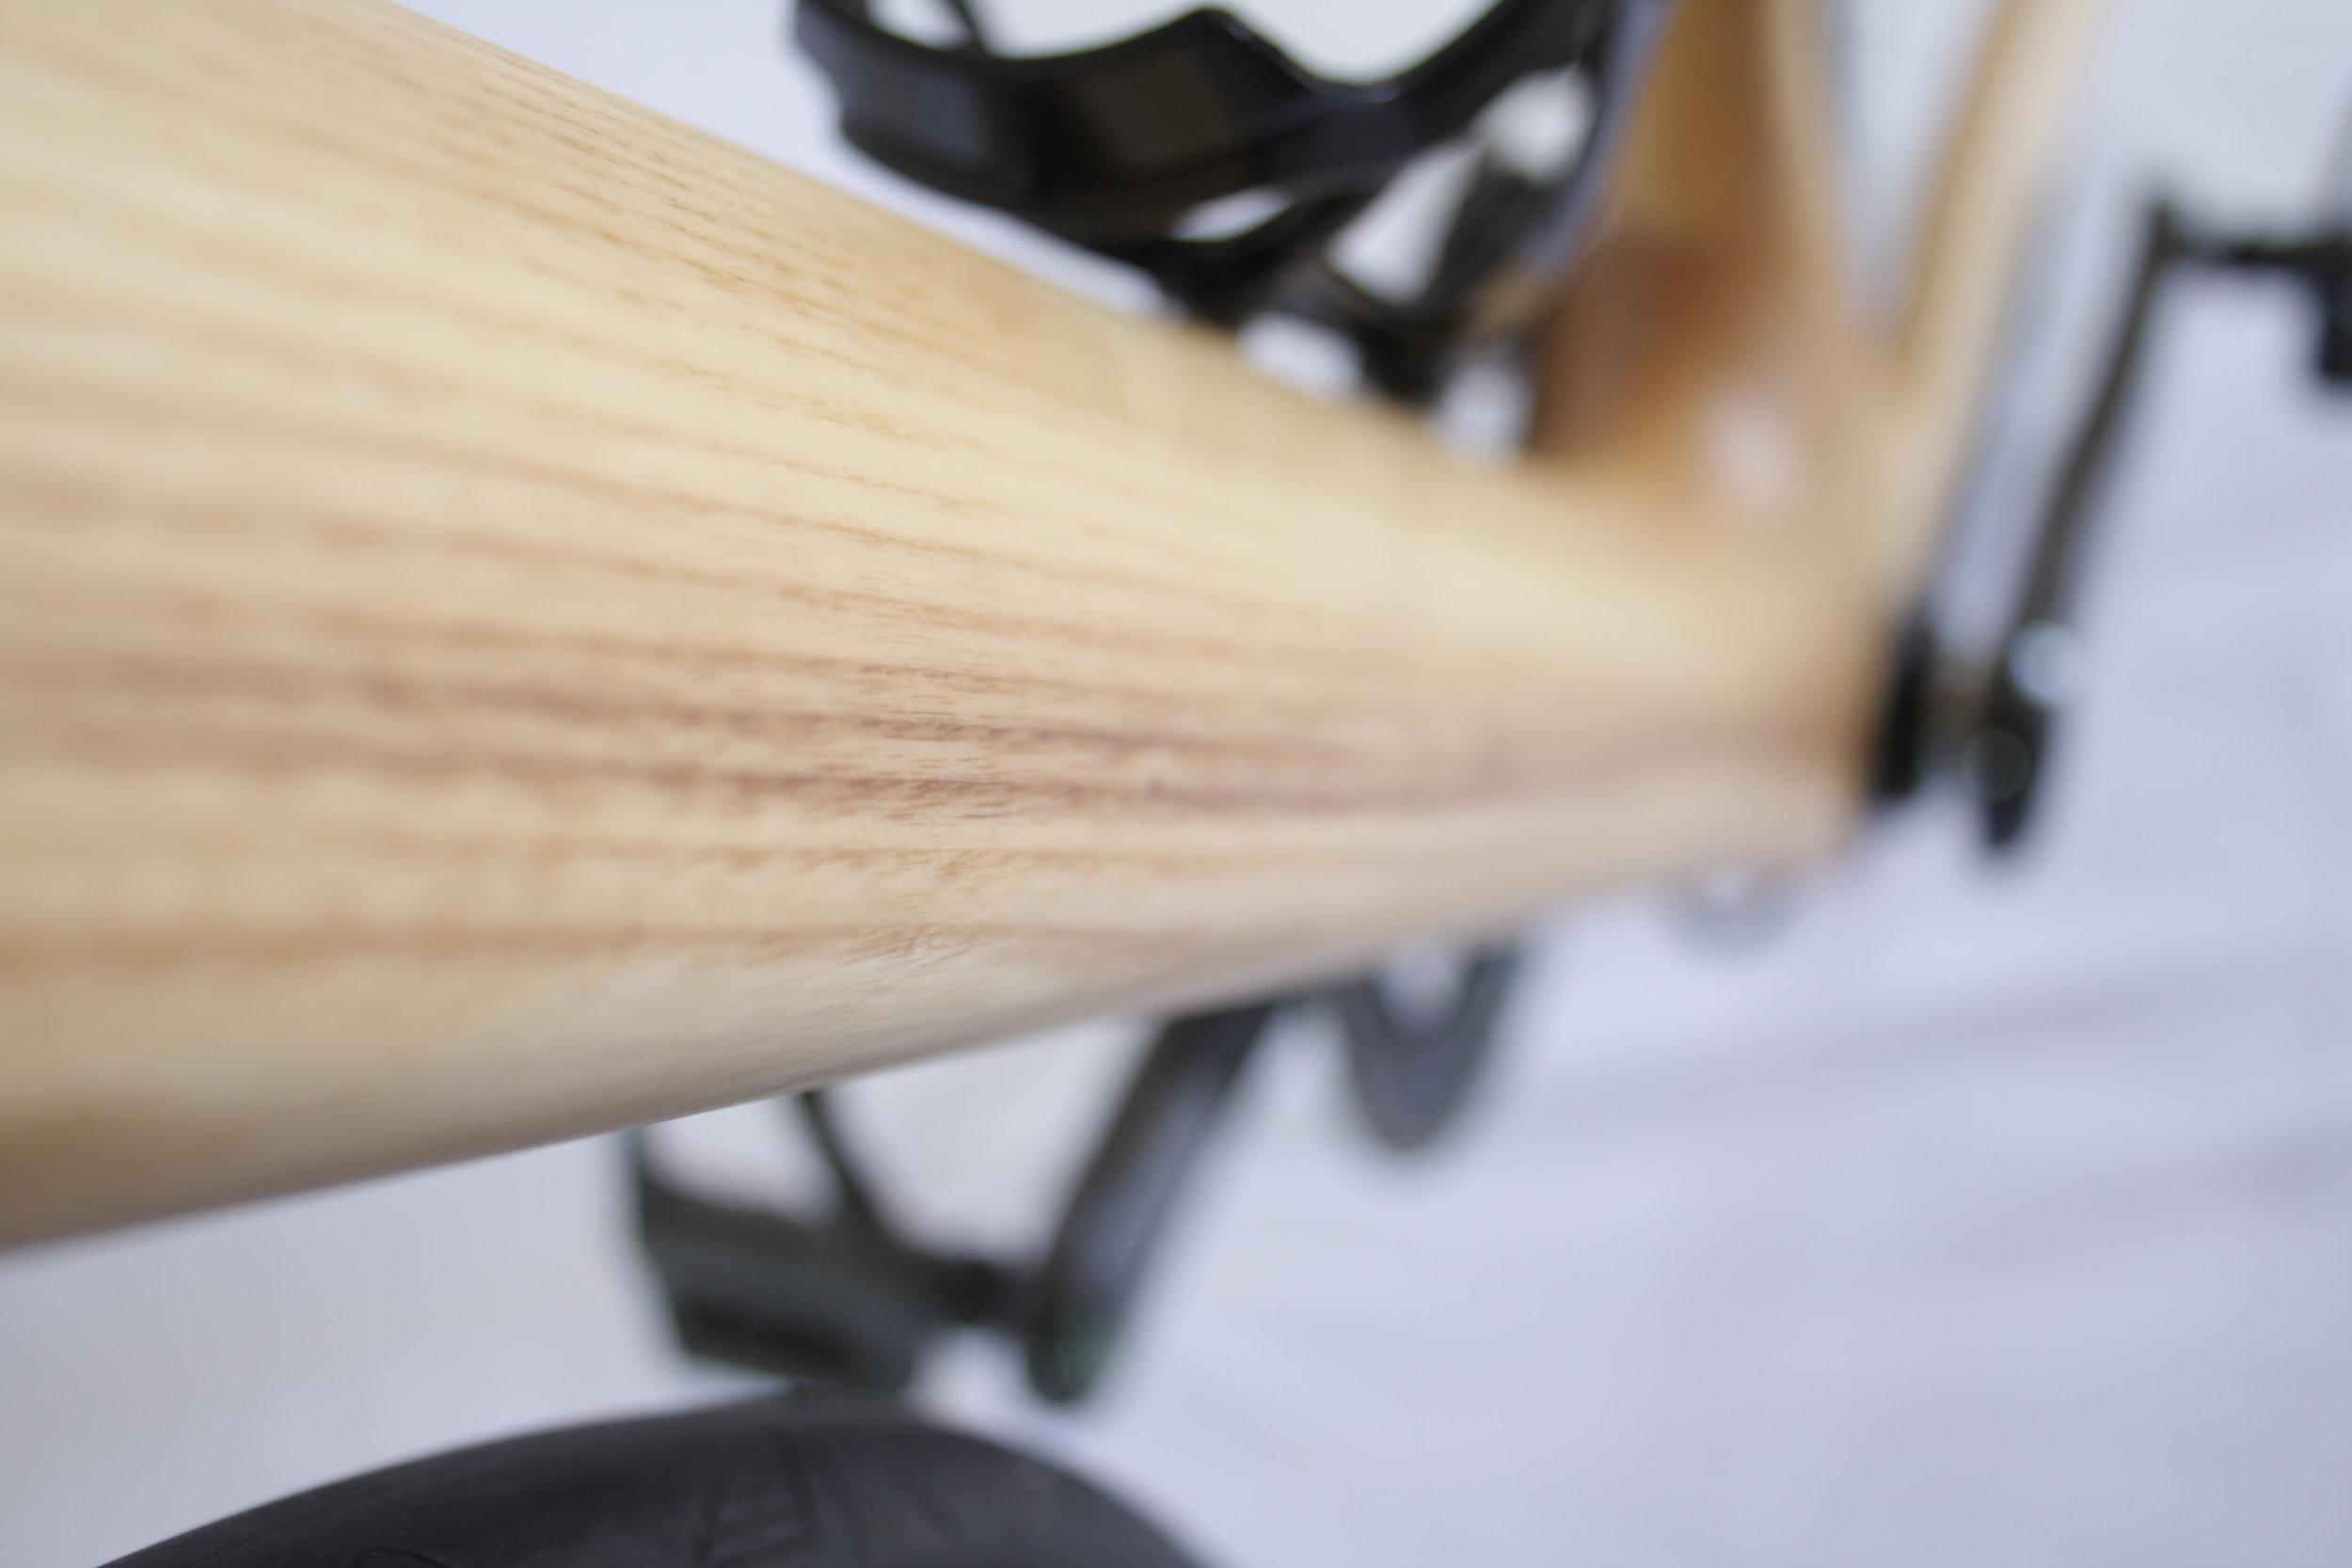 Montauk Hardwood Bikes, Downtube Closeup.JPG